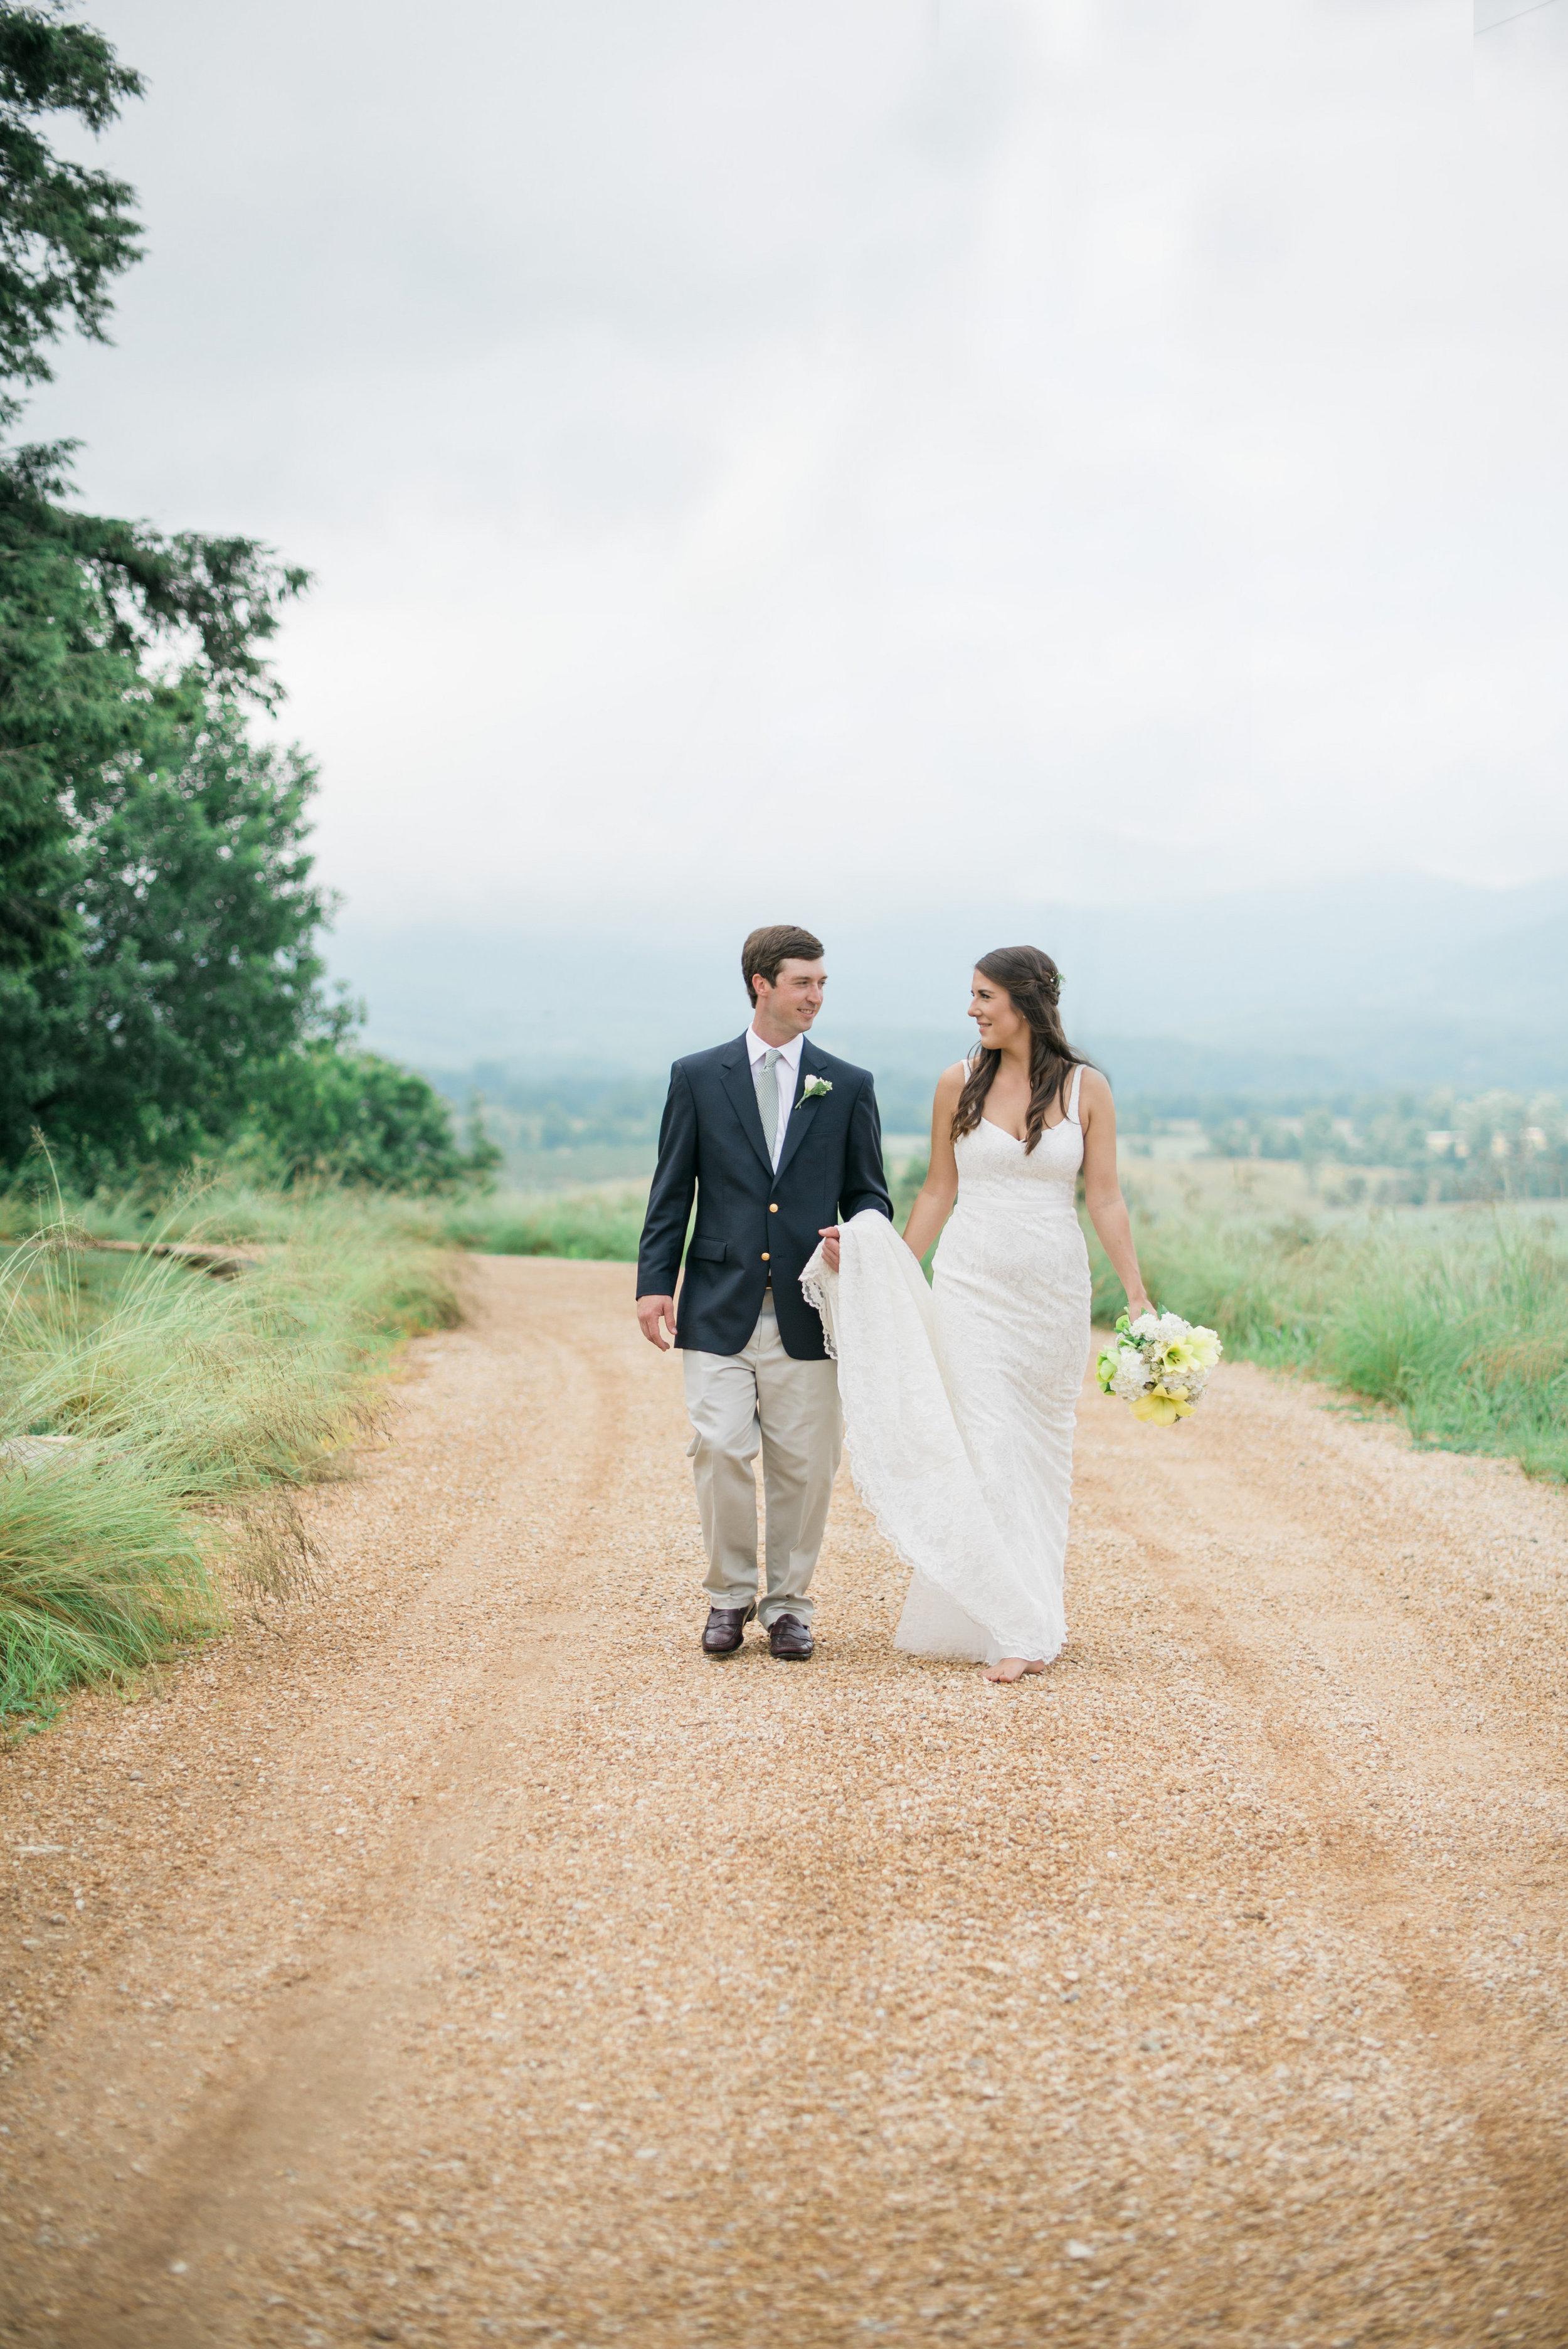 062715-Hannah+Drew-pharsalia-wedding-kathryn-ivy-photography-110.jpg